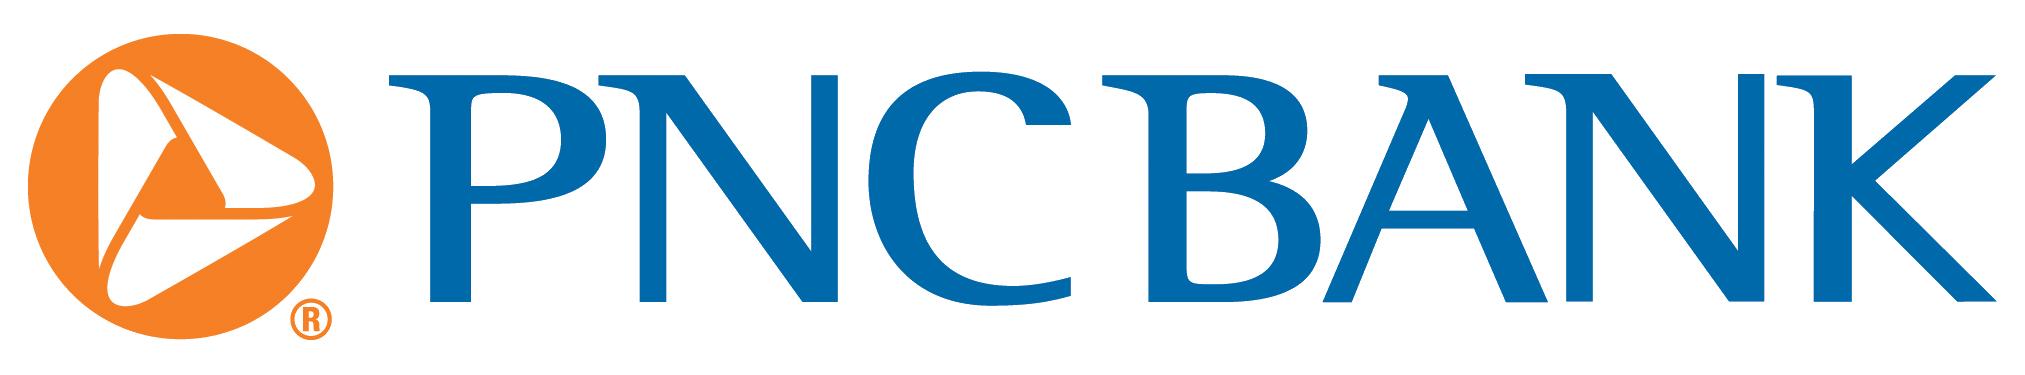 pnc_bank_logo.png